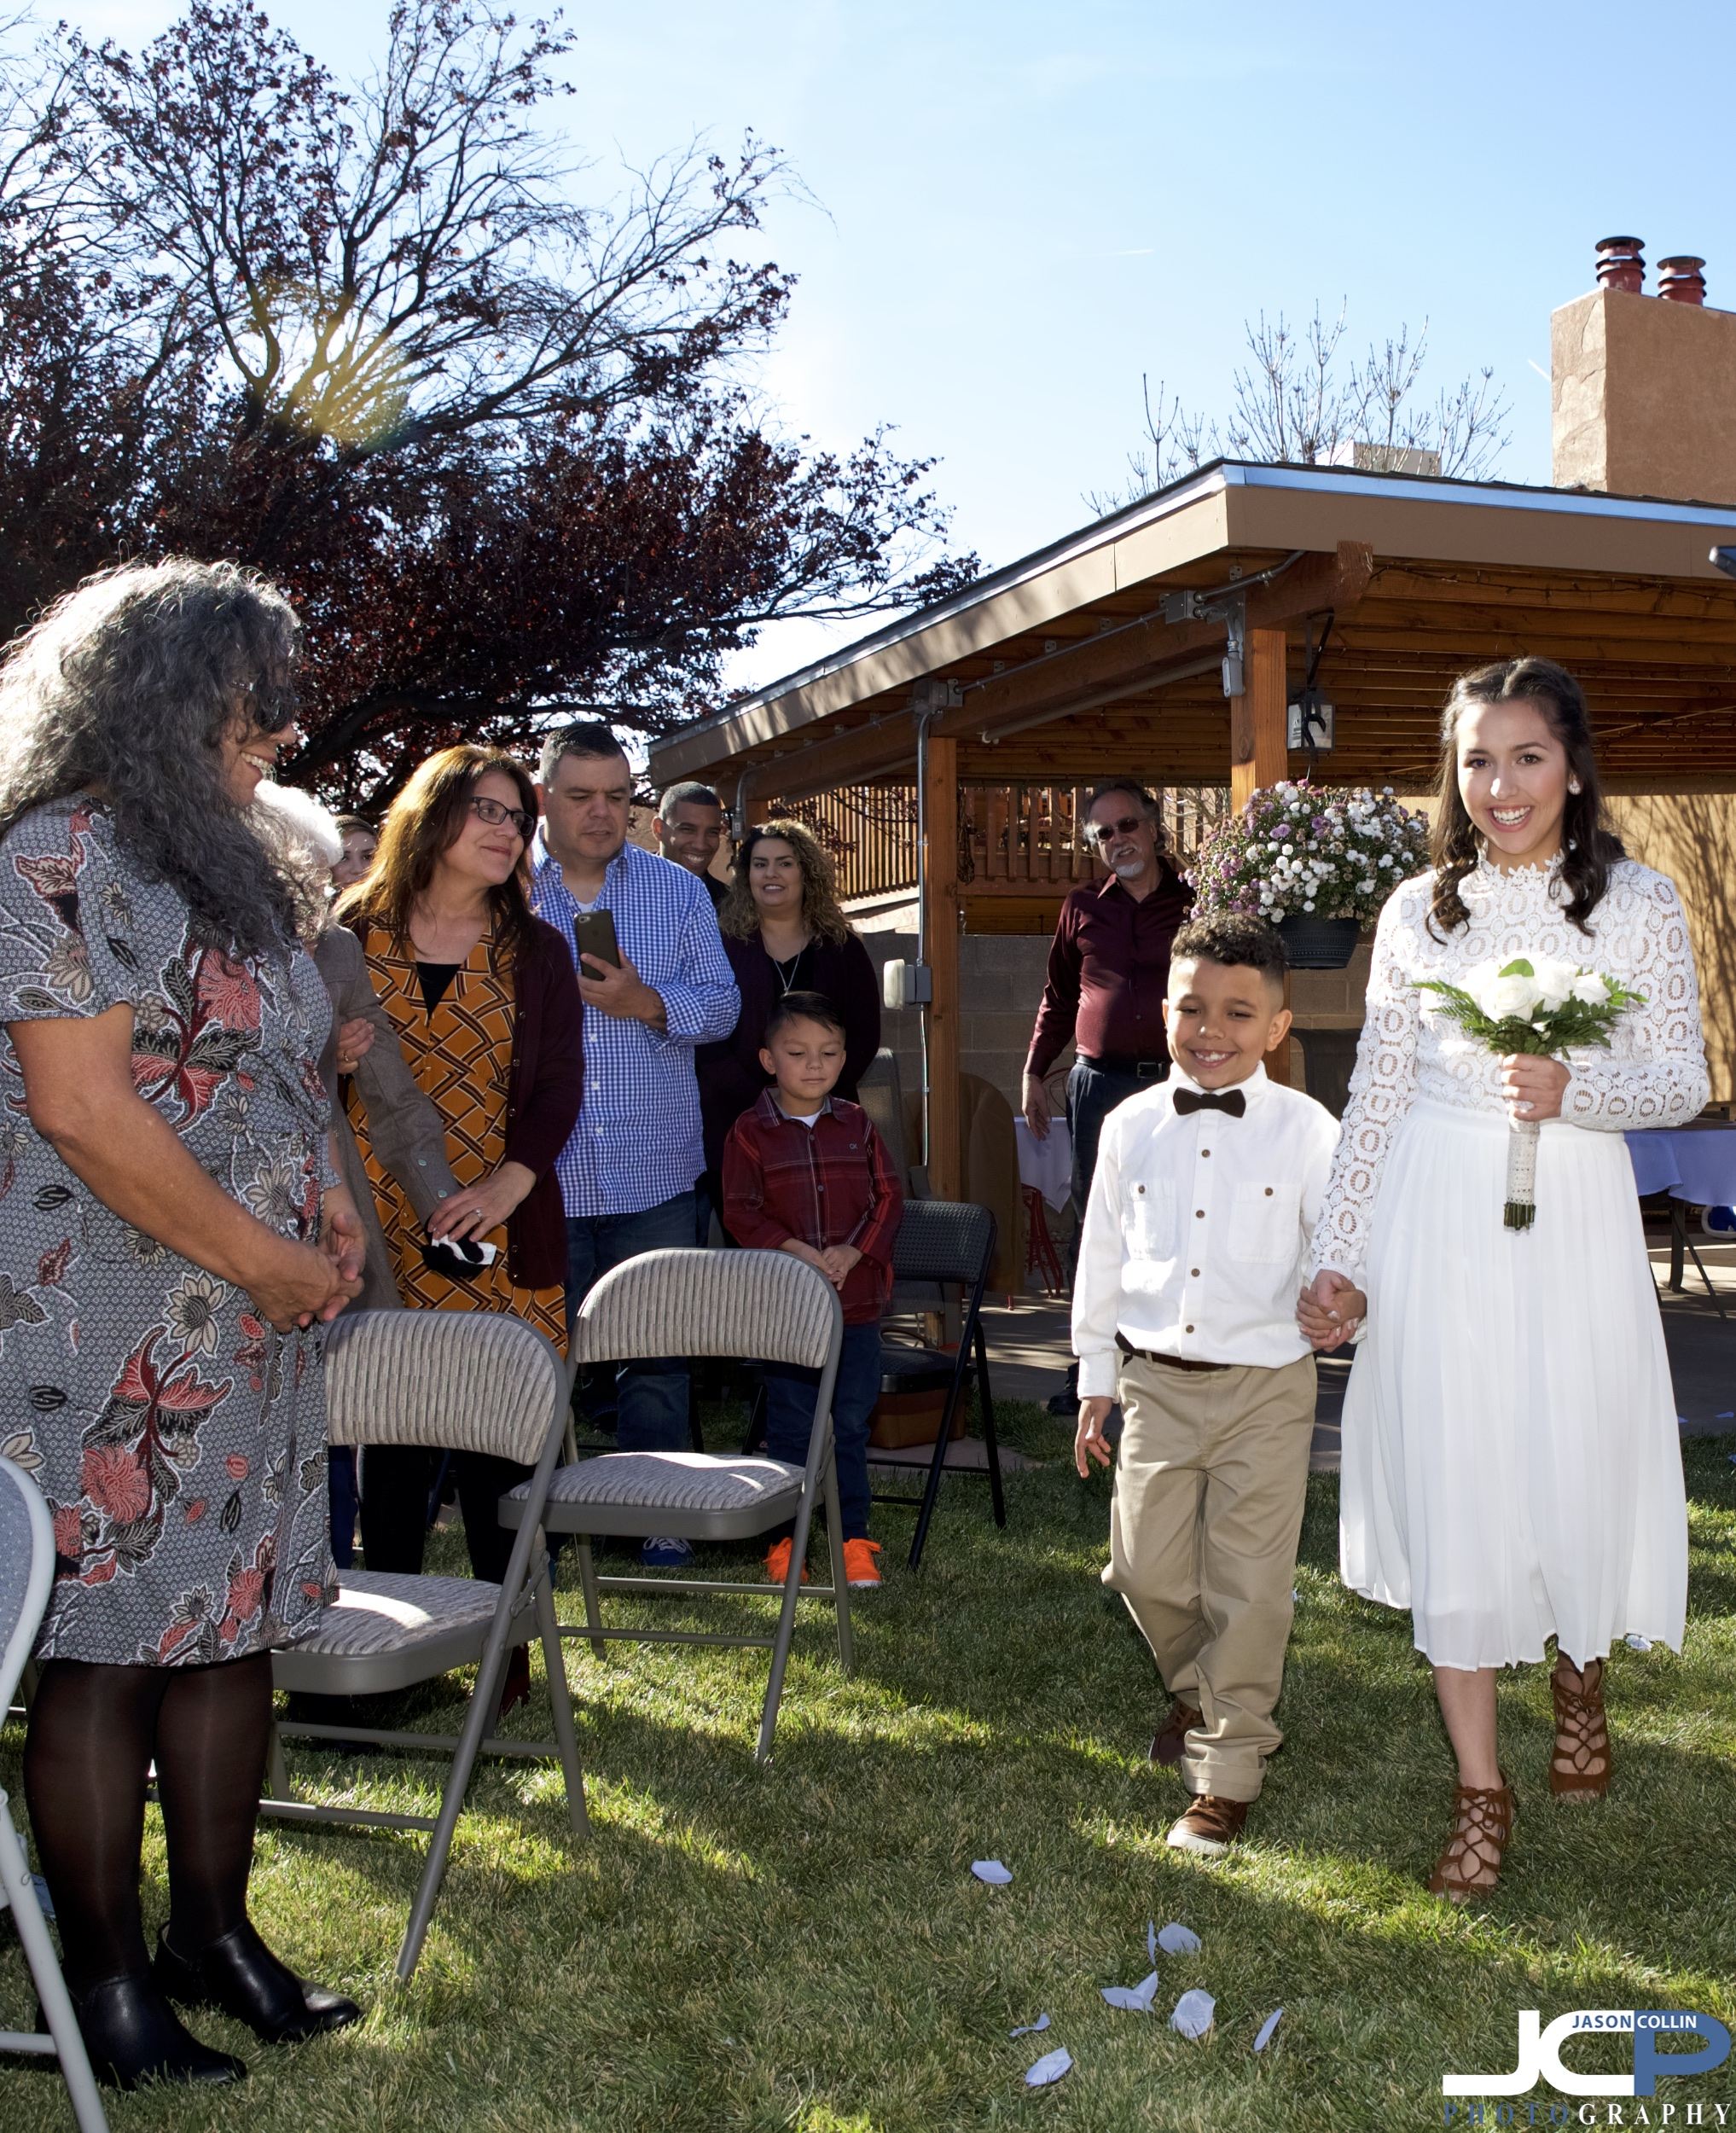 ac-11-17-2018-wedding-113266.jpg